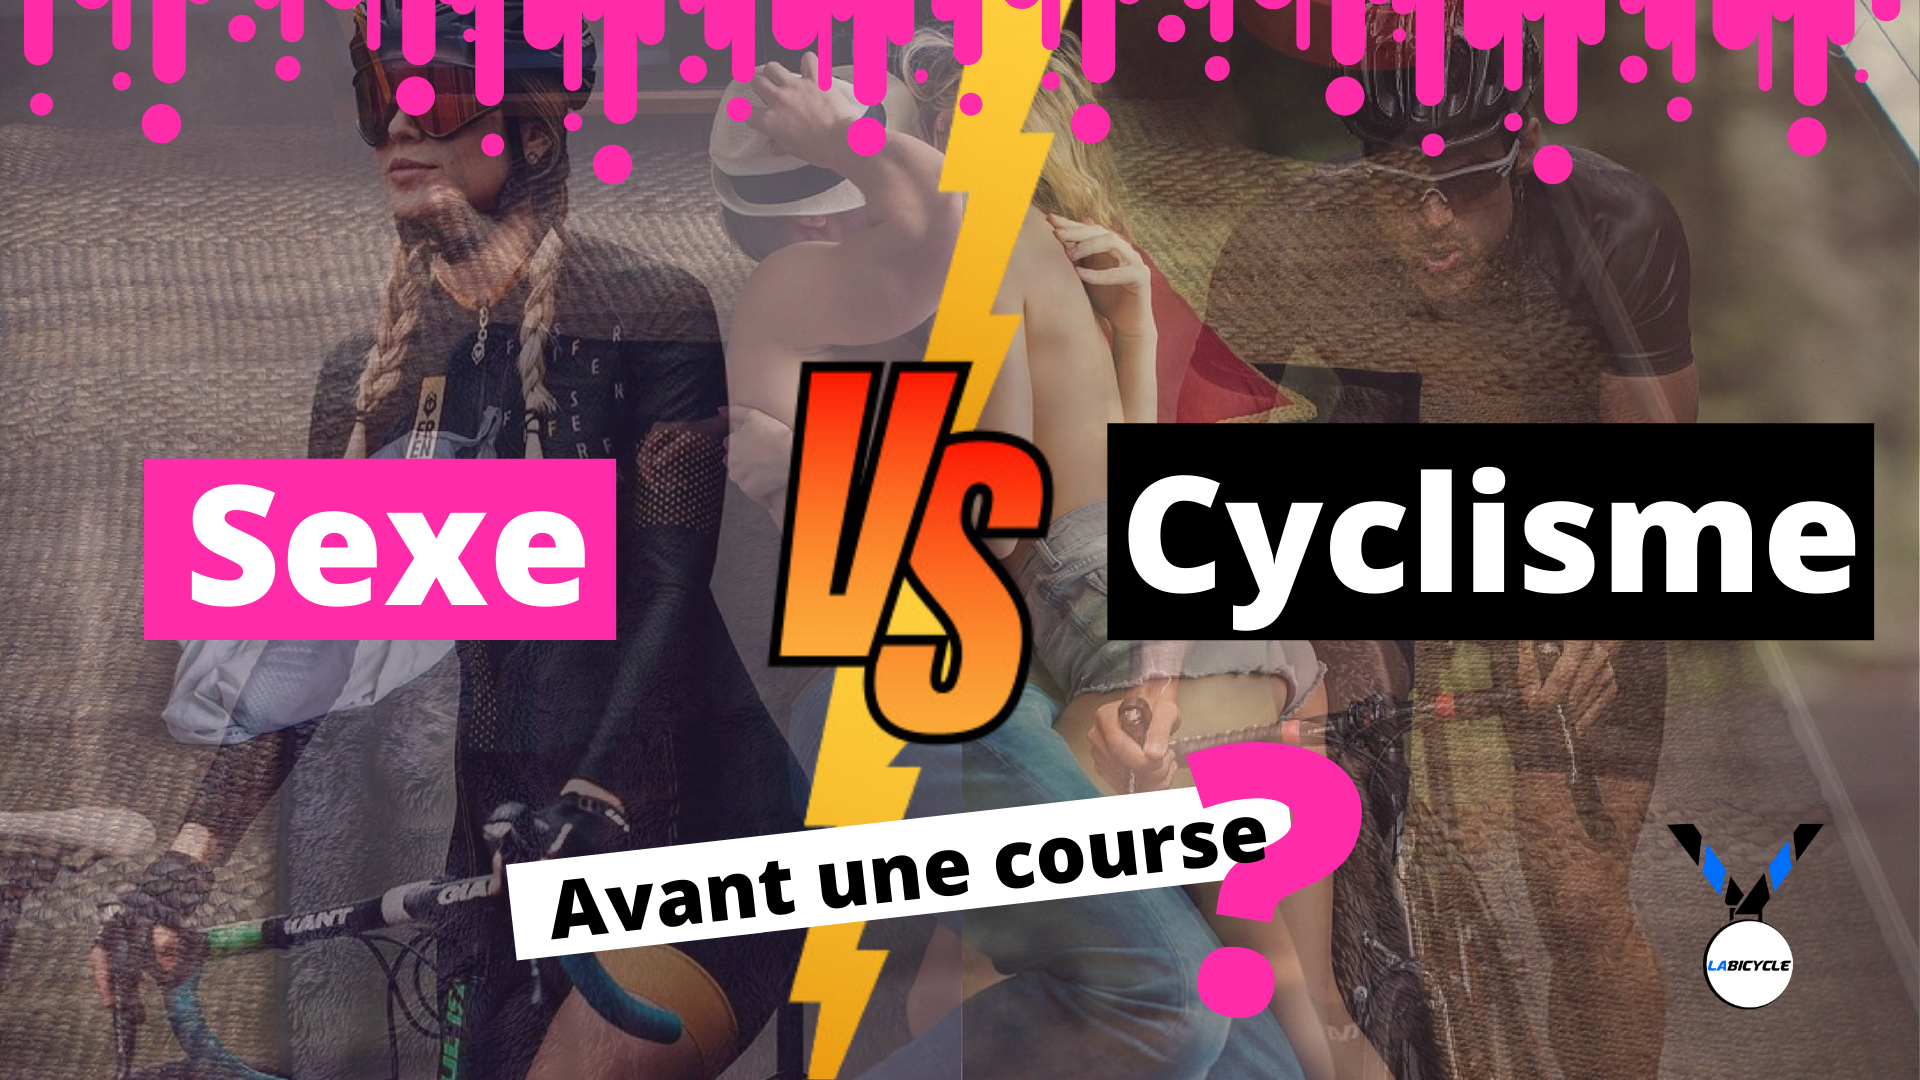 Sexe et cyclisme